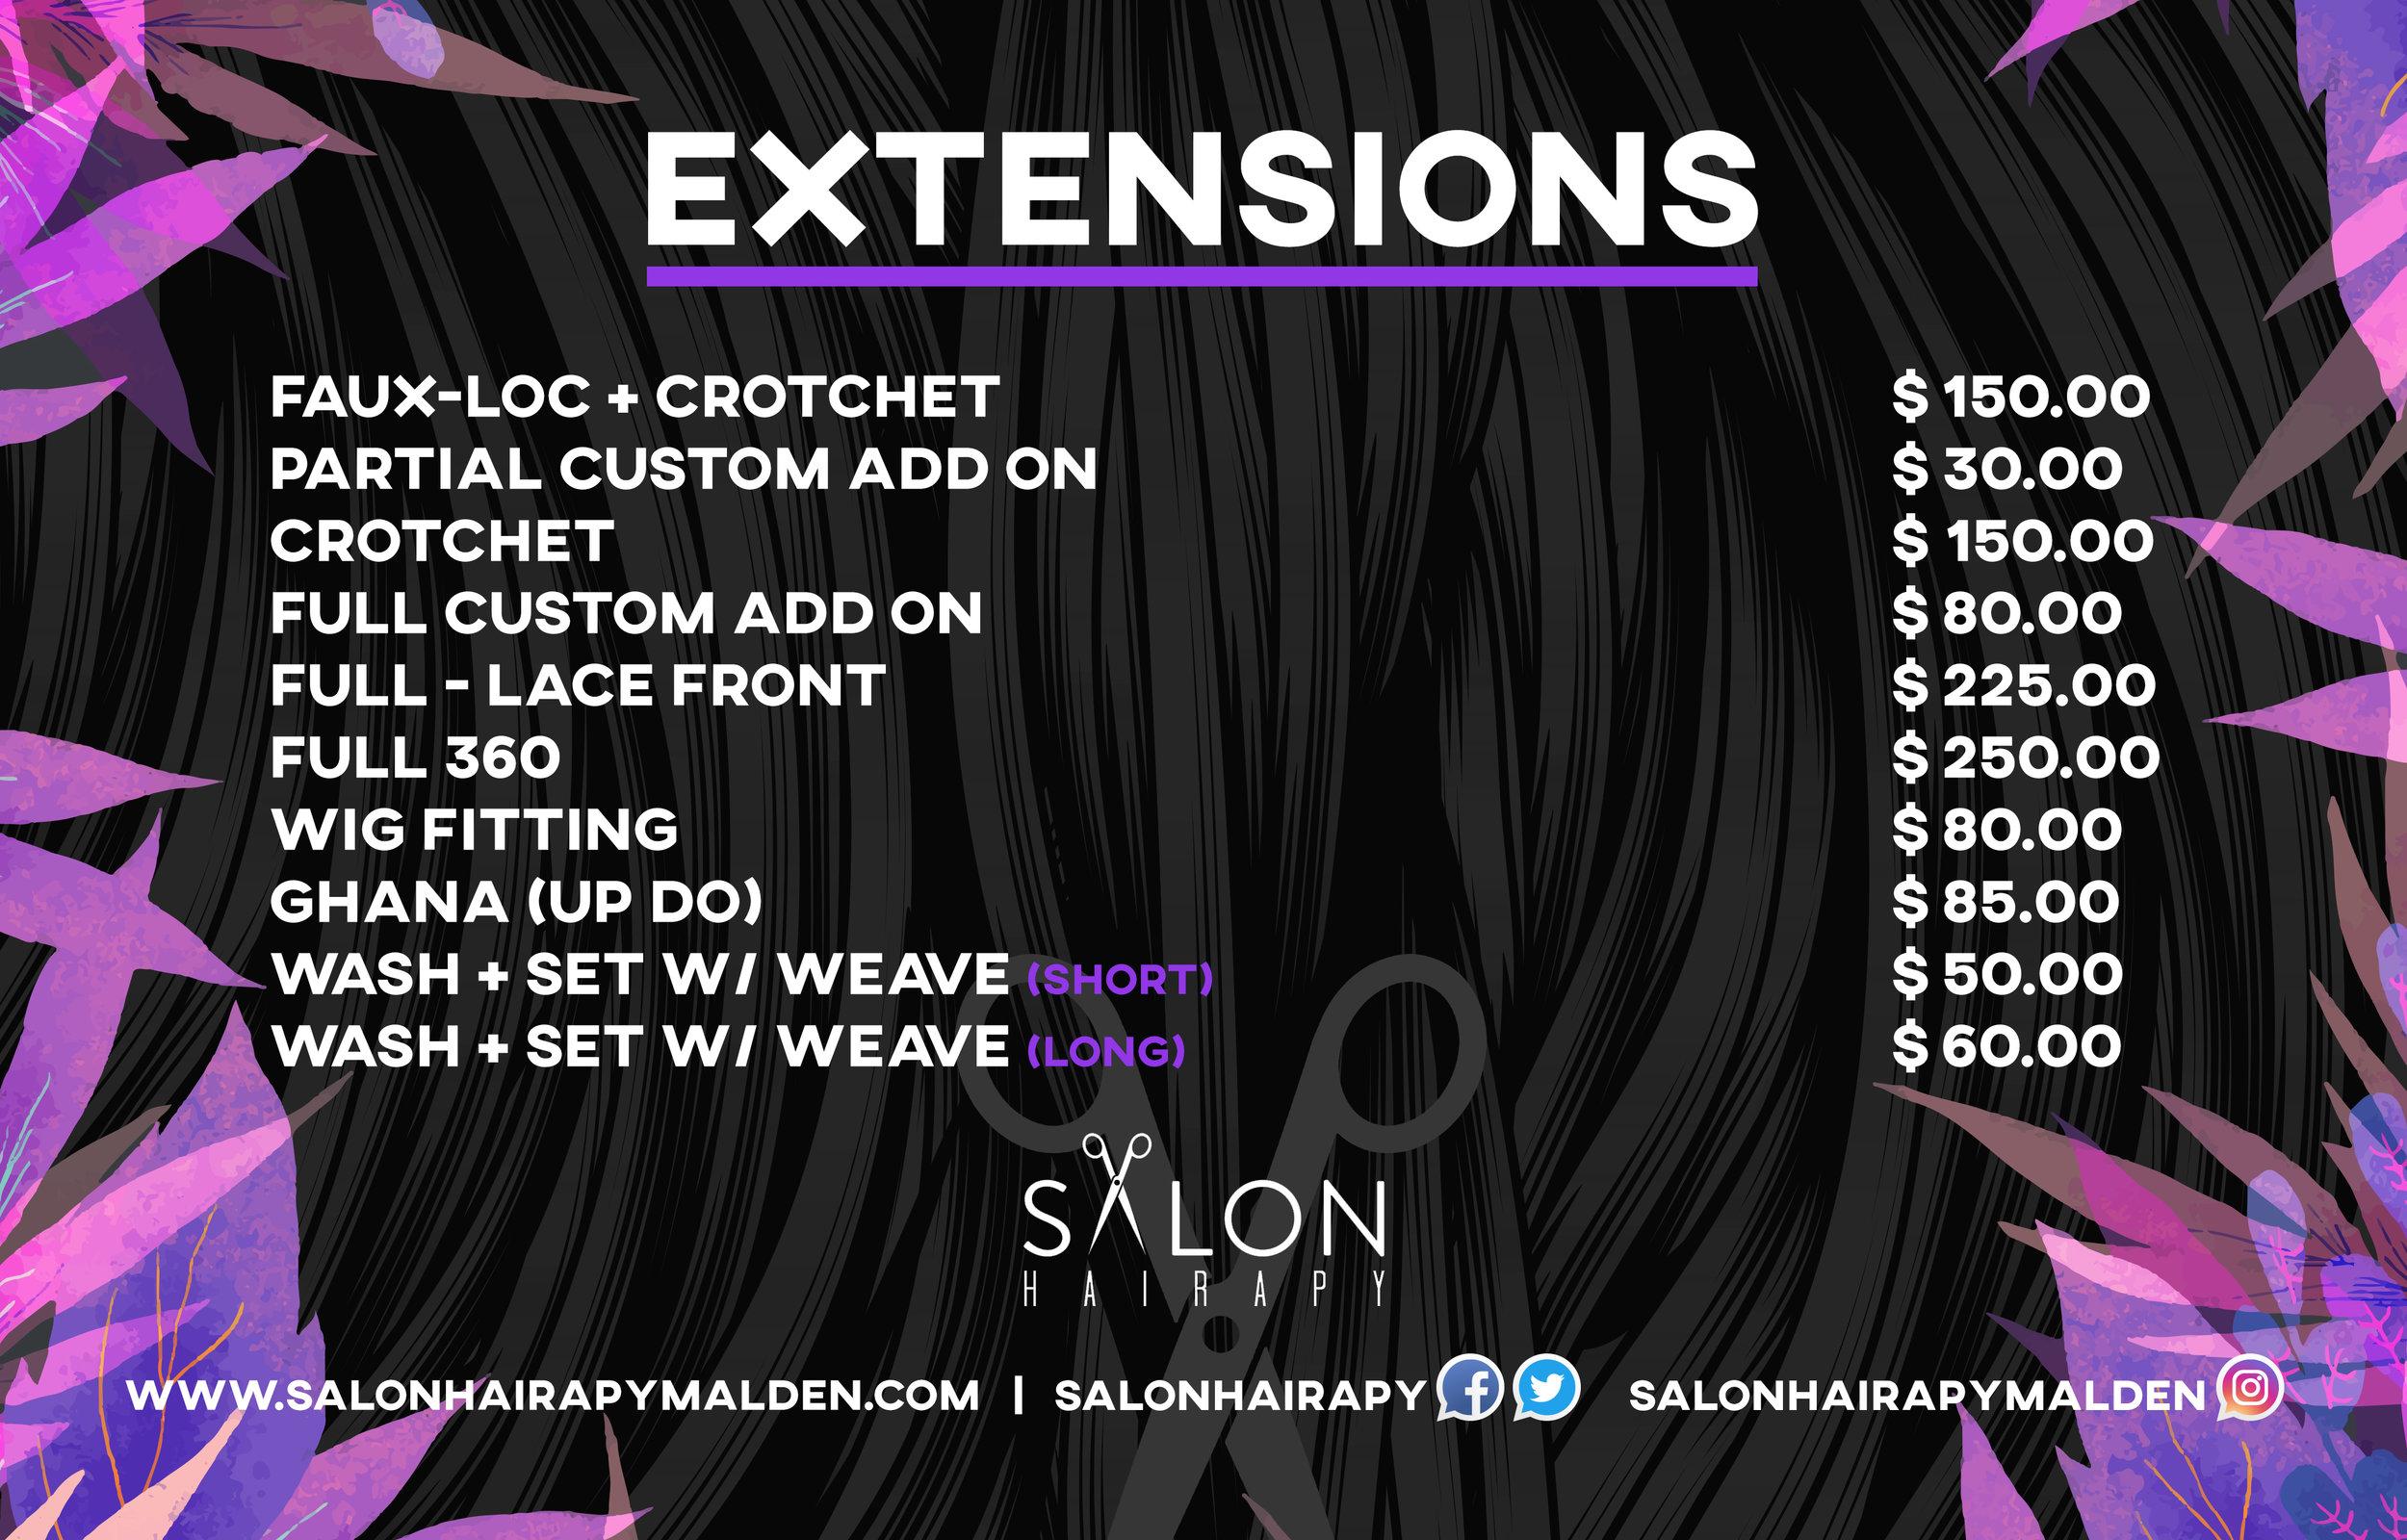 6-Extensions-2.jpg